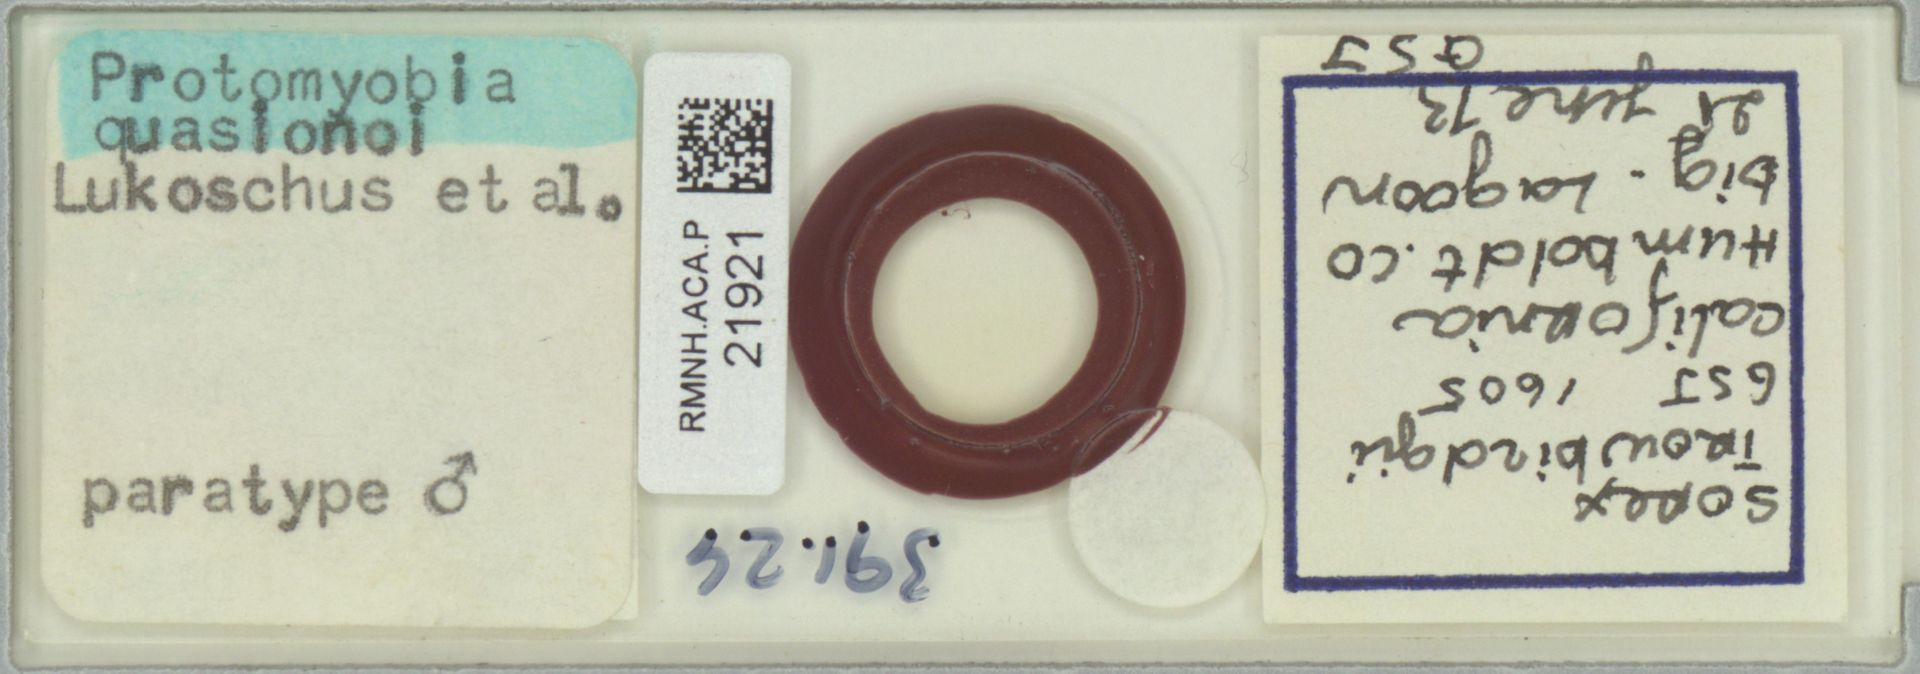 RMNH.ACA.P.21921 | Protomyobia quasionoi Lukoschus et al